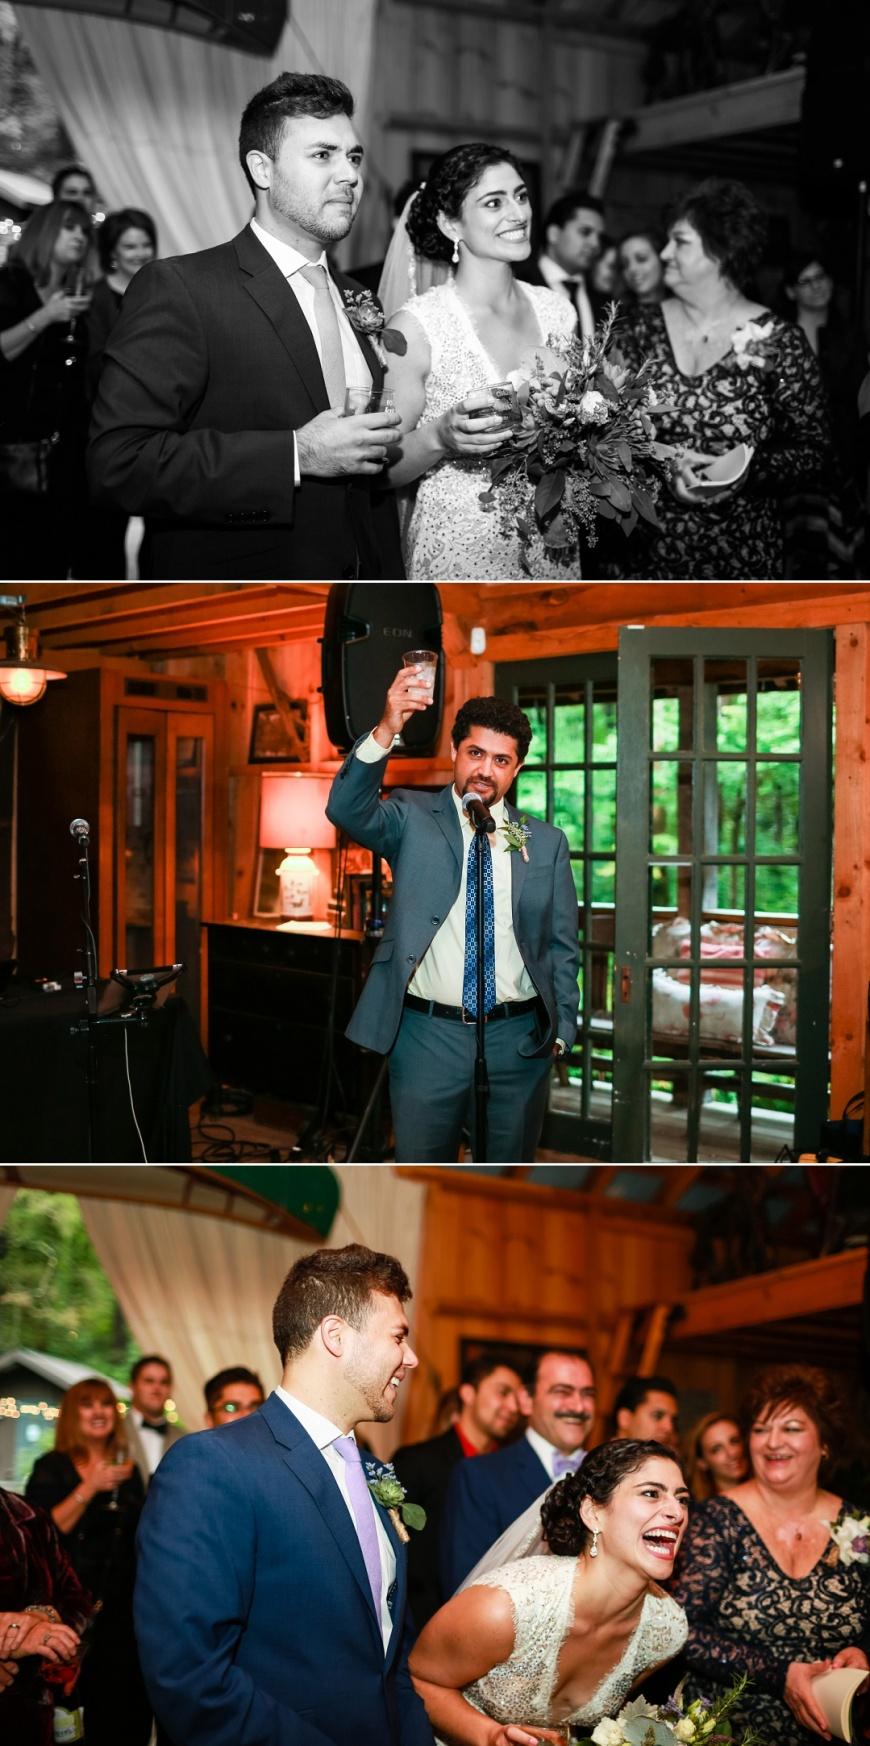 Tall-Timber-Barn-Poconos-Wedding-Photographer_1080.jpg